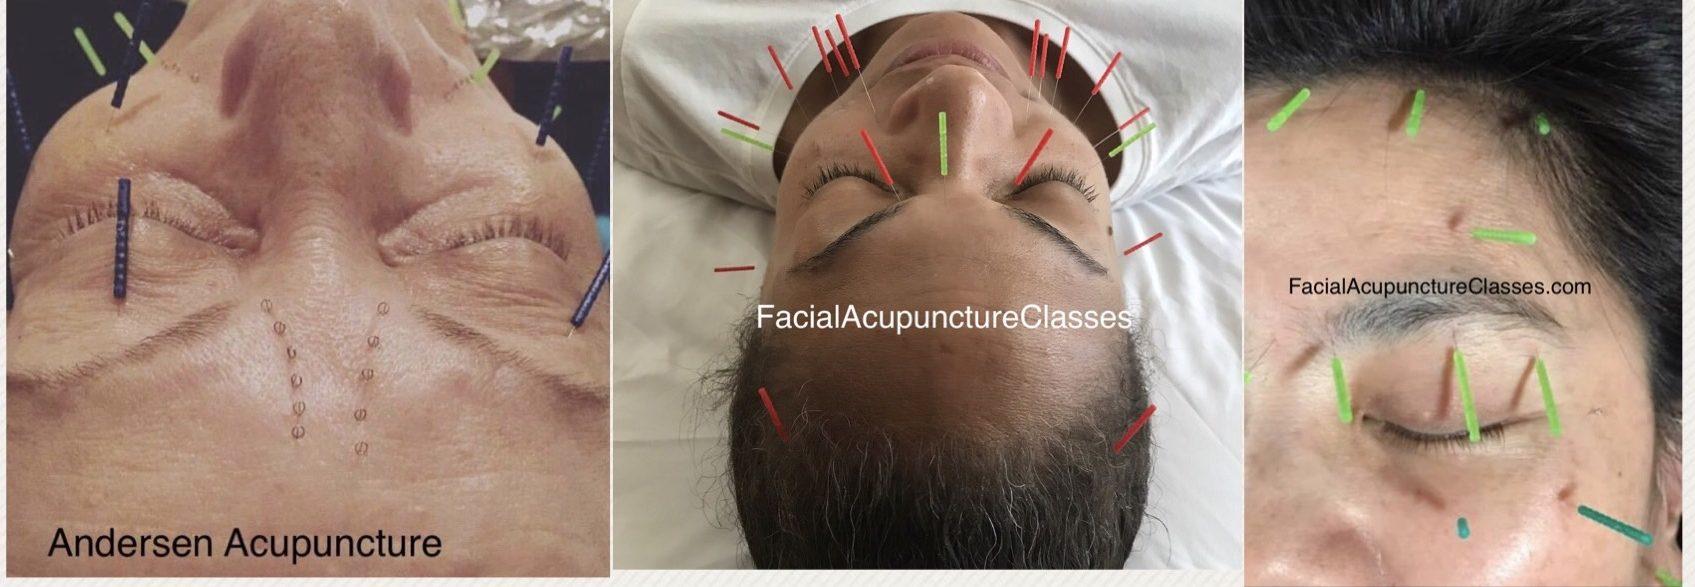 Blog - Facial Acupuncture CEU Classes